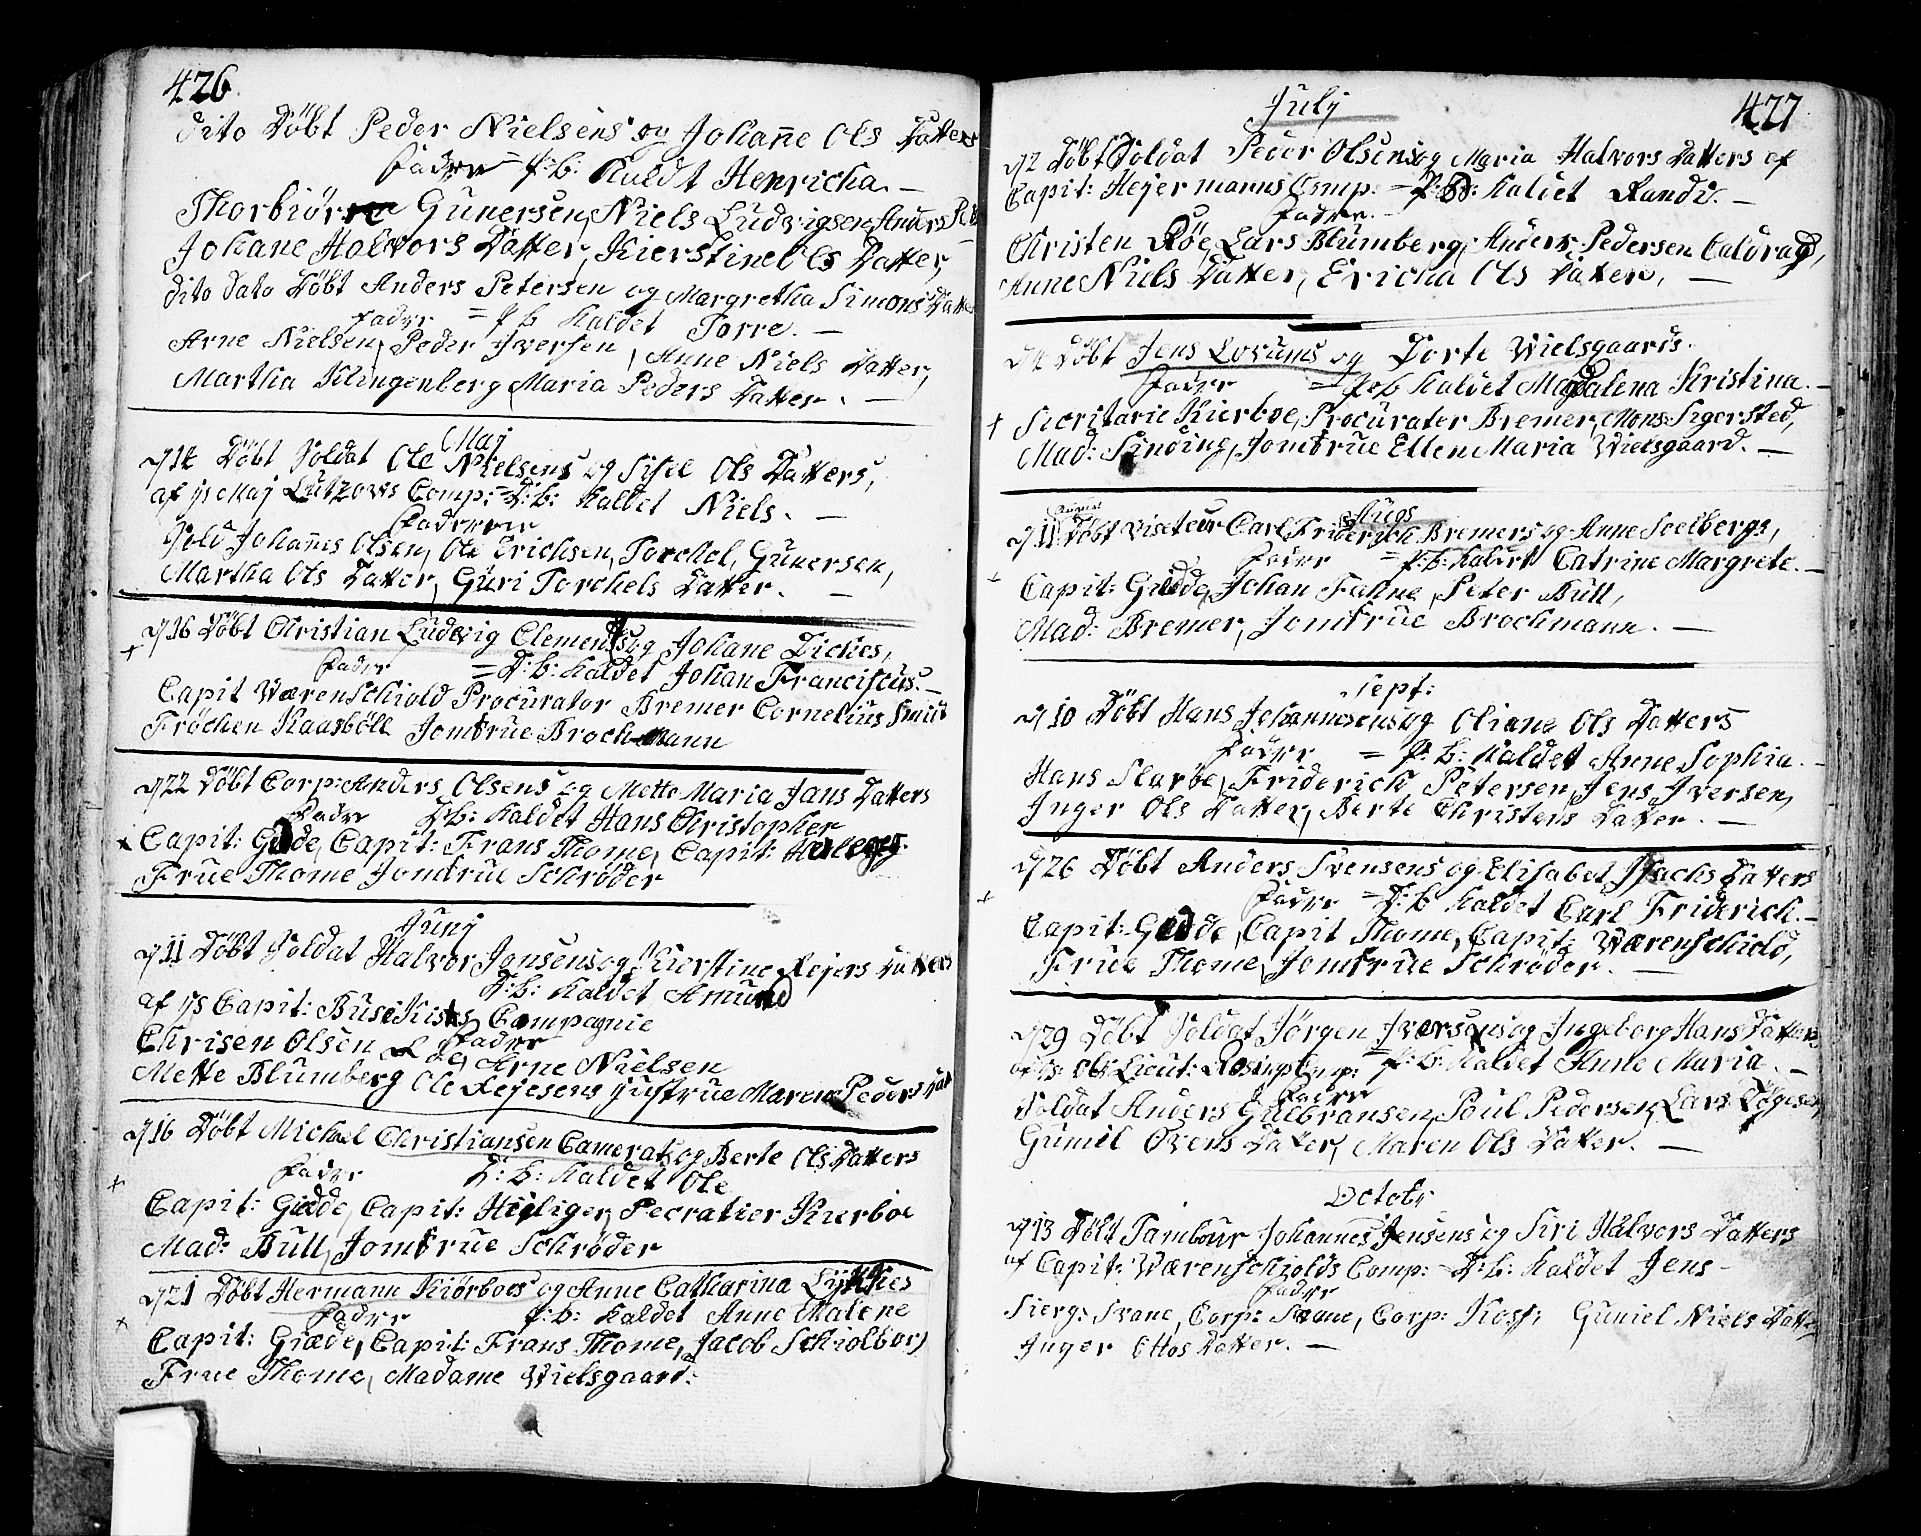 SAO, Fredrikstad prestekontor Kirkebøker, F/Fa/L0002: Ministerialbok nr. 2, 1750-1804, s. 426-427